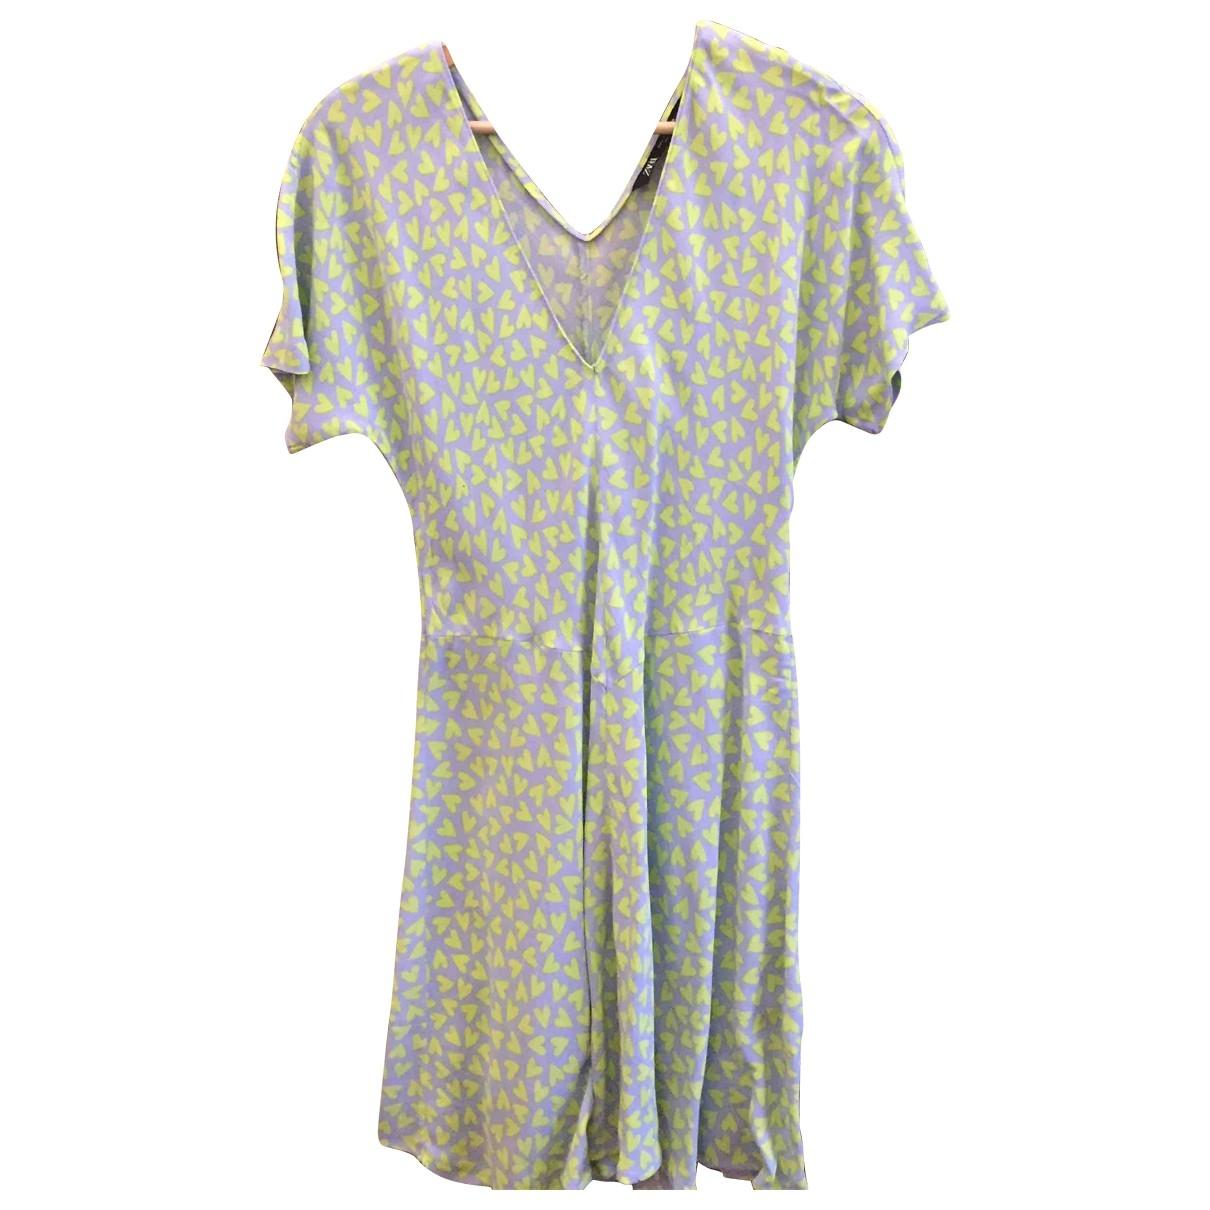 Zara \N Turquoise dress for Women L International